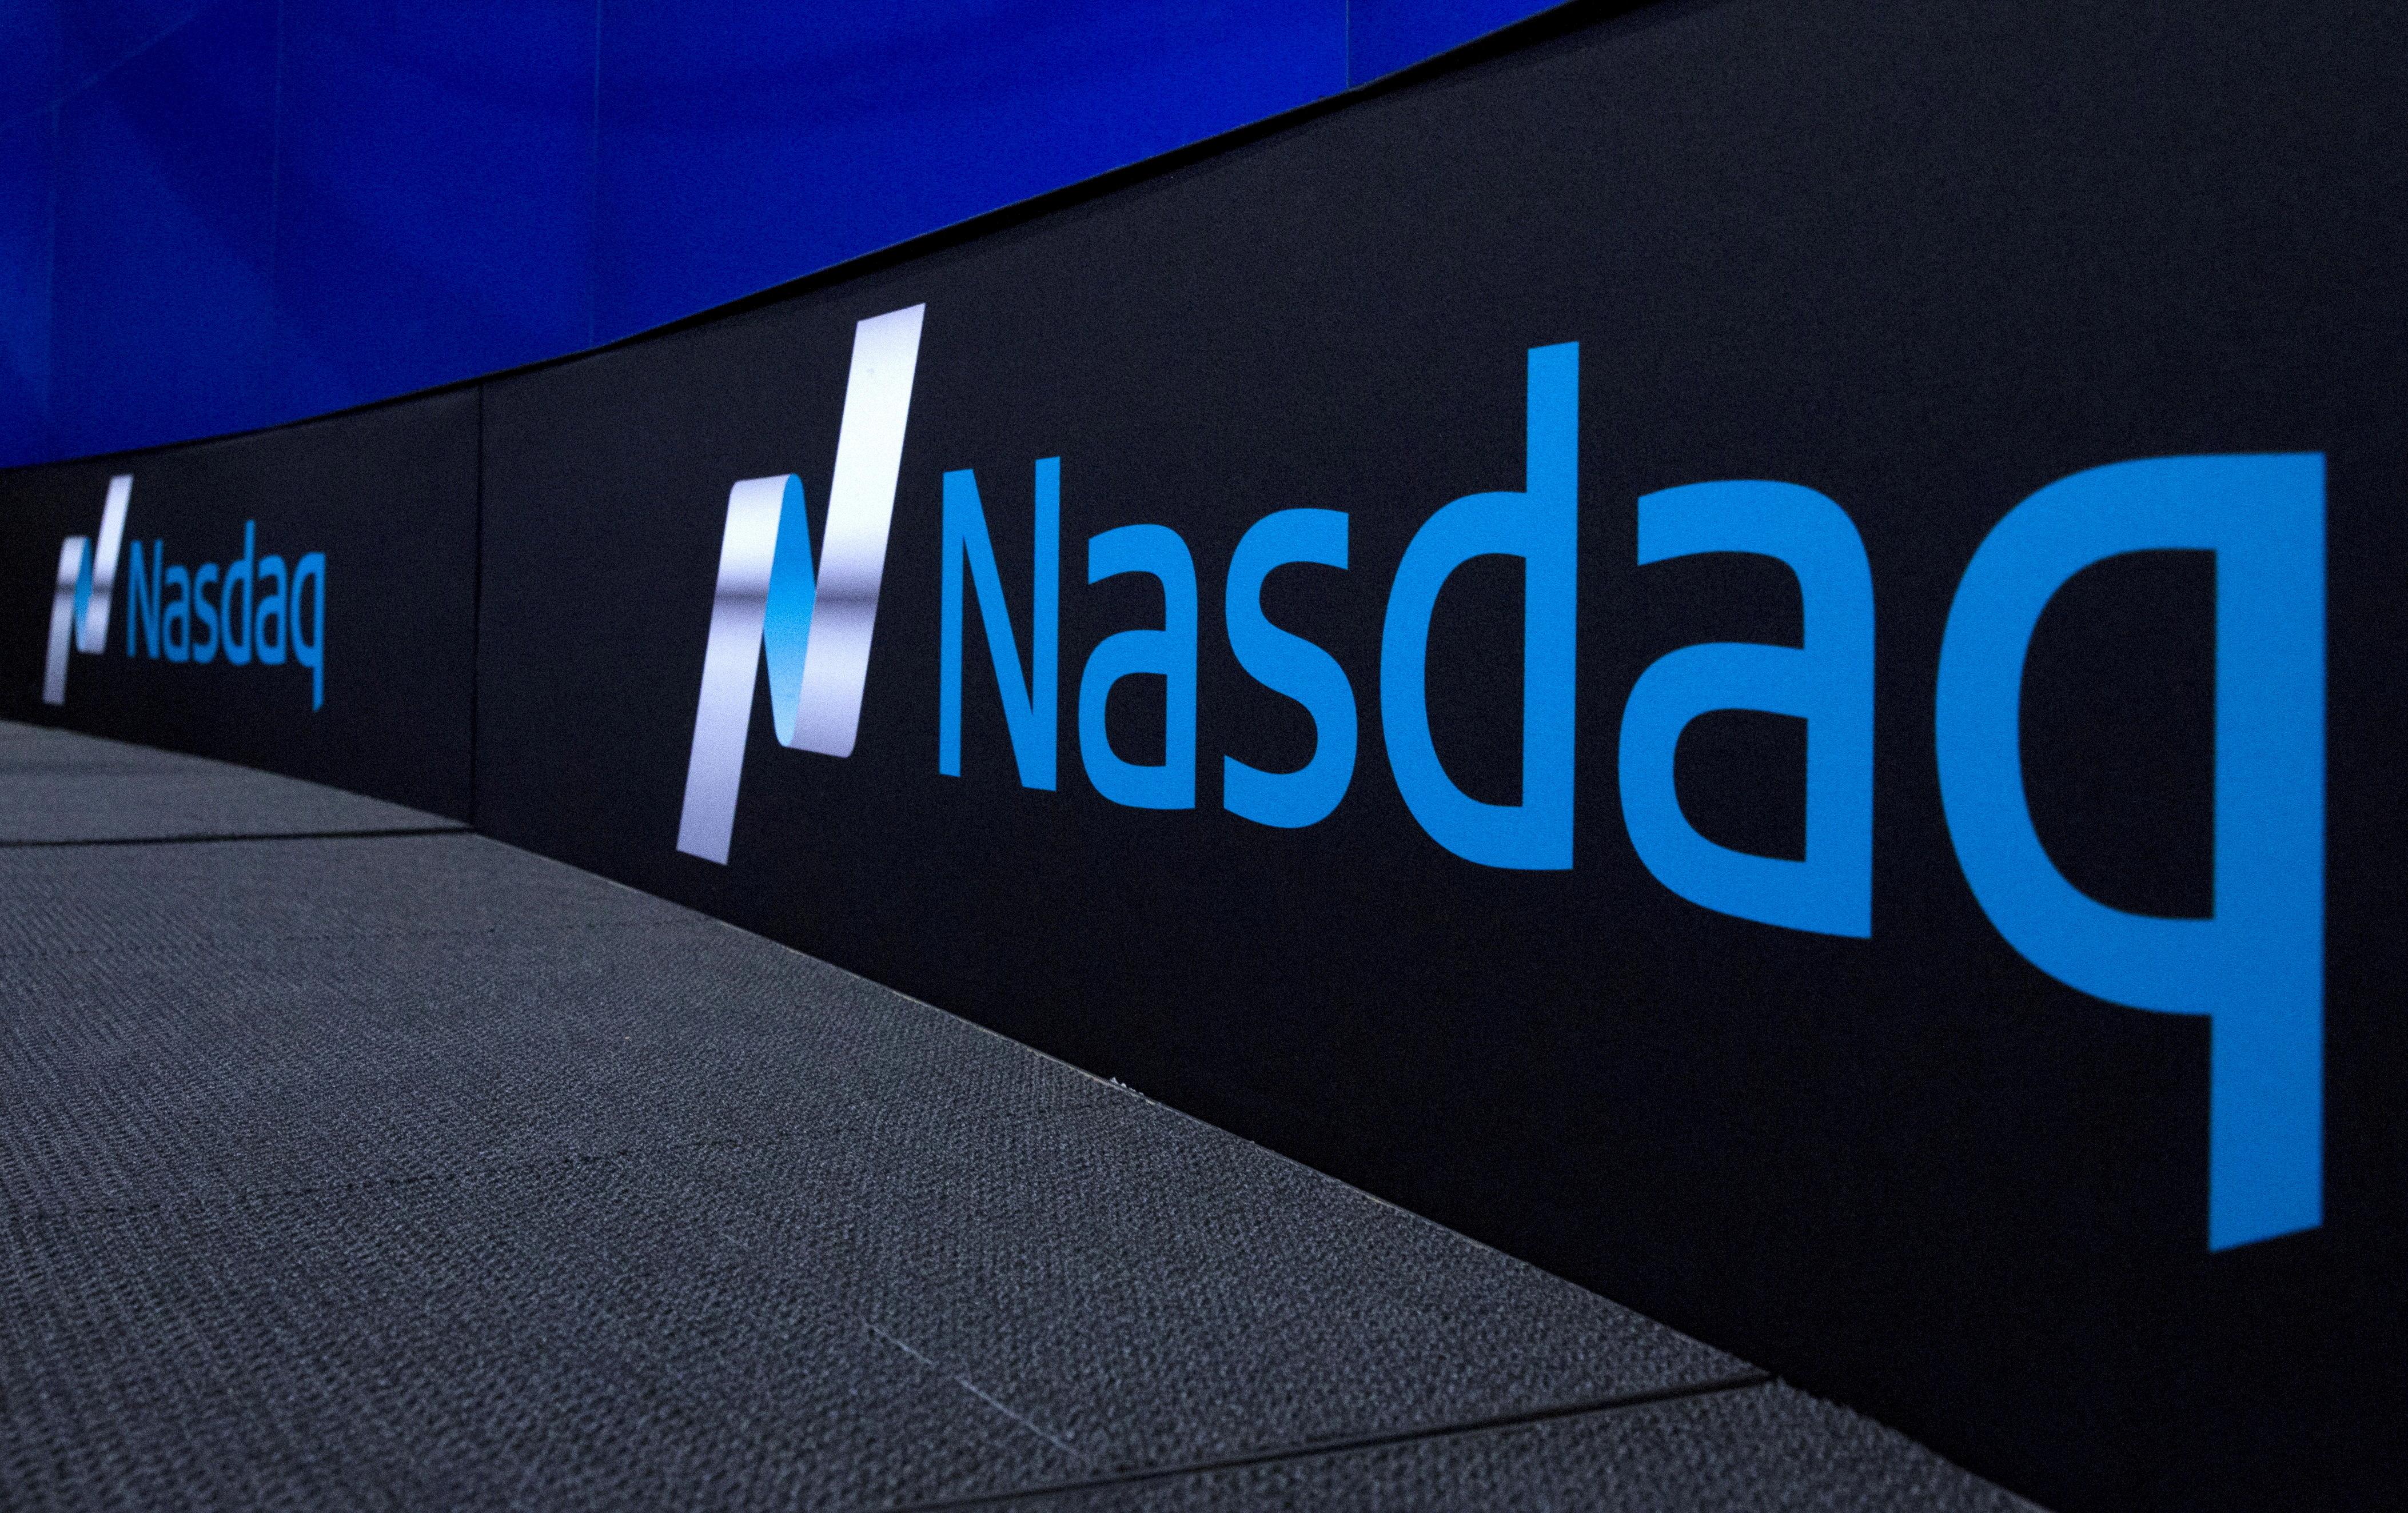 Nasdaq logo displayed at the Nasdaq Market site in New York September 2, 2015. REUTERS/Brendan McDermid